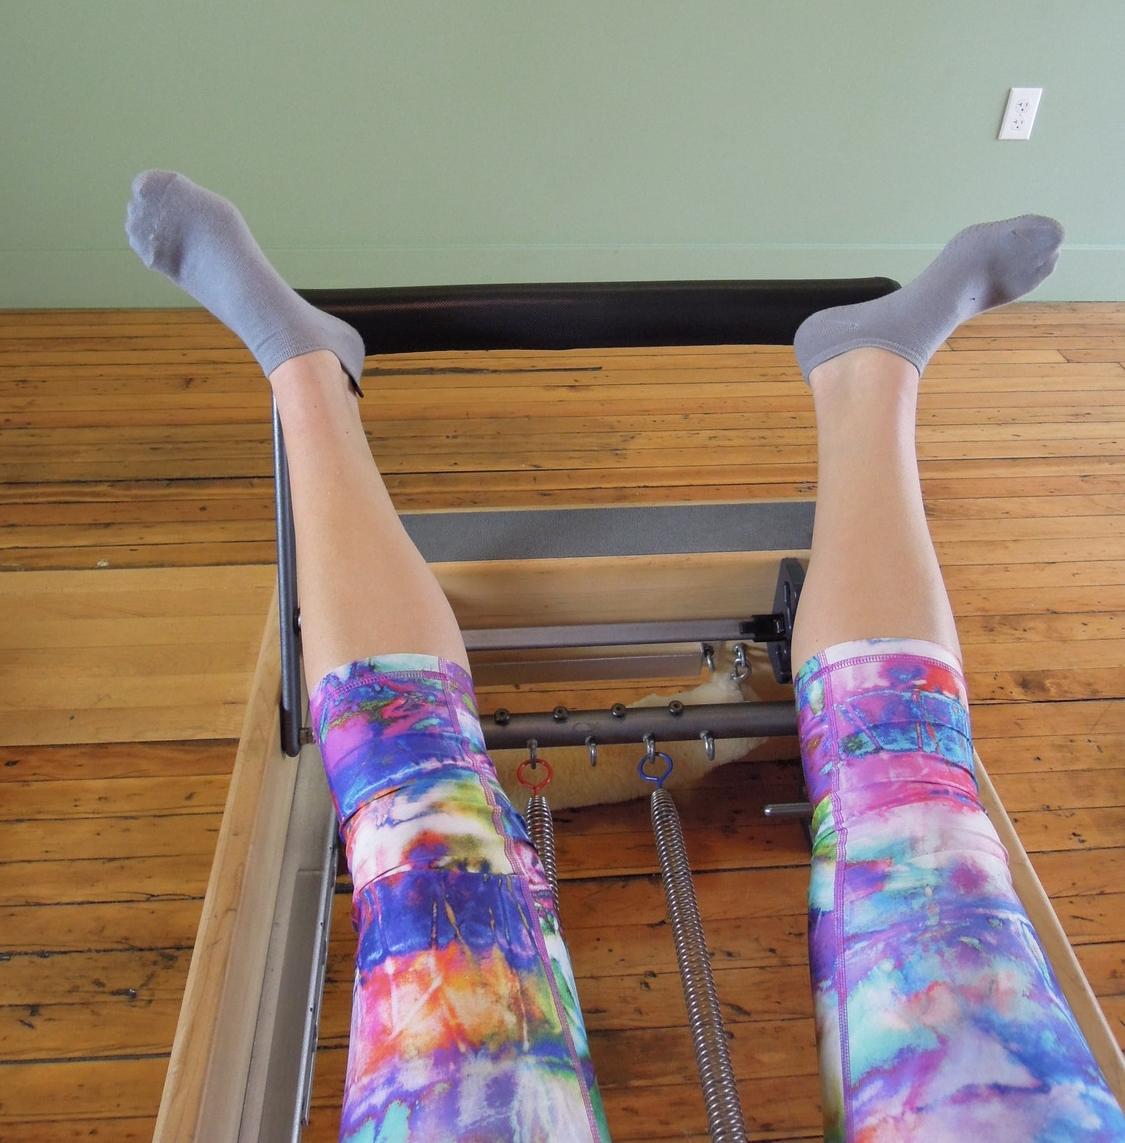 Leg press turned out wide V on heels